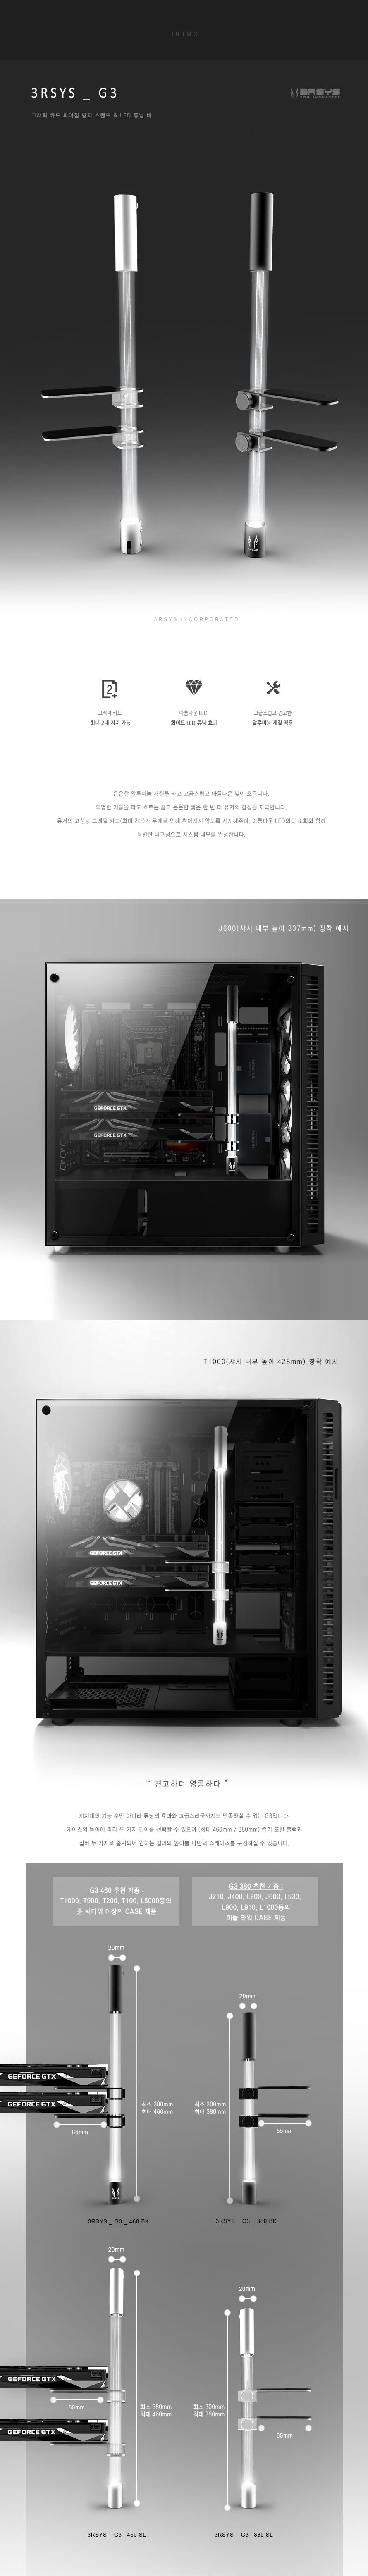 3RSYS  ICEAGE G3 460 그래픽카드 지지대(BLACK)